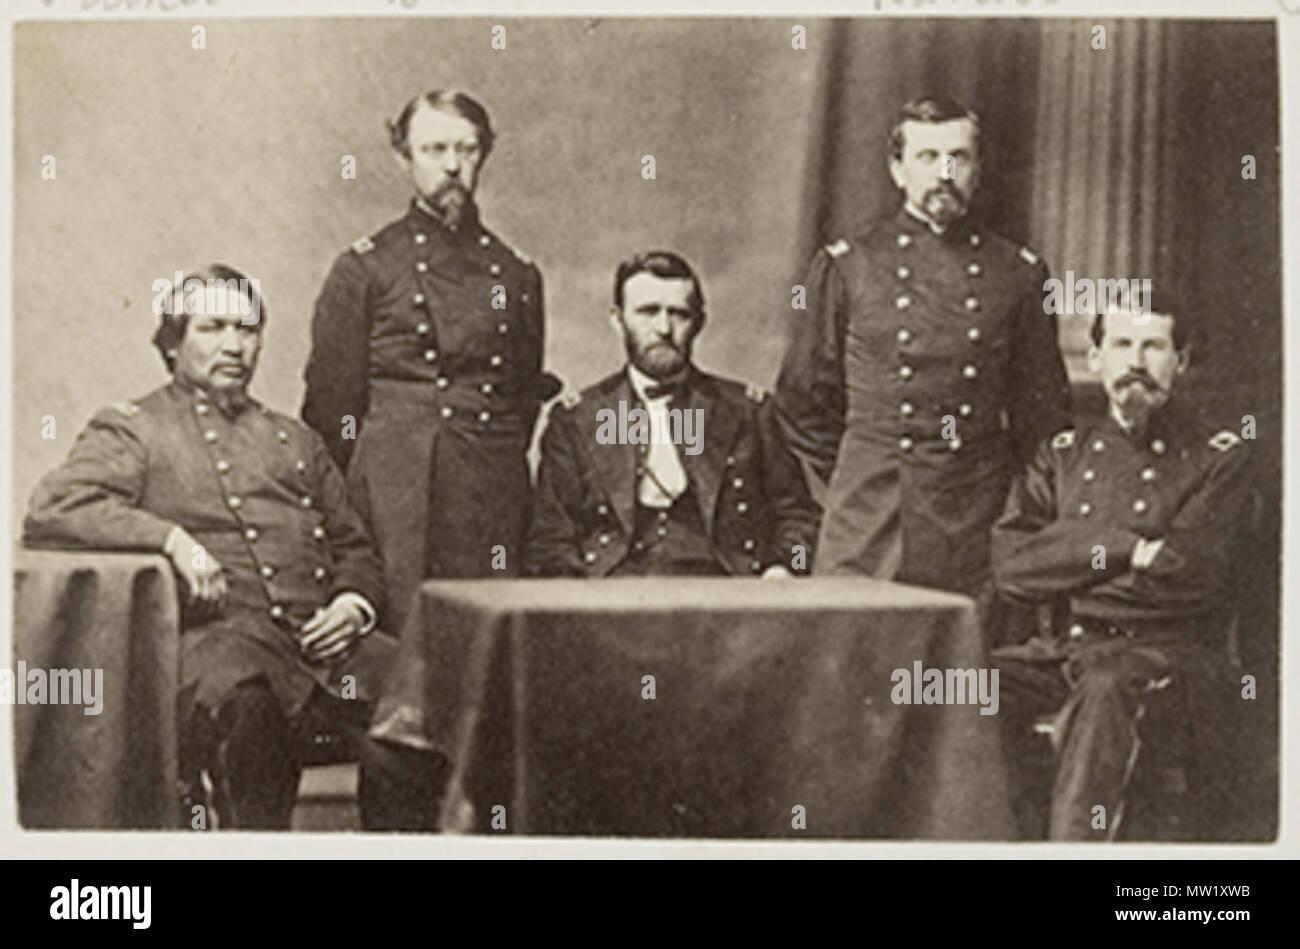 PHOTO PRINT 1891-1865 AMERICAN CIVIL WAR 03